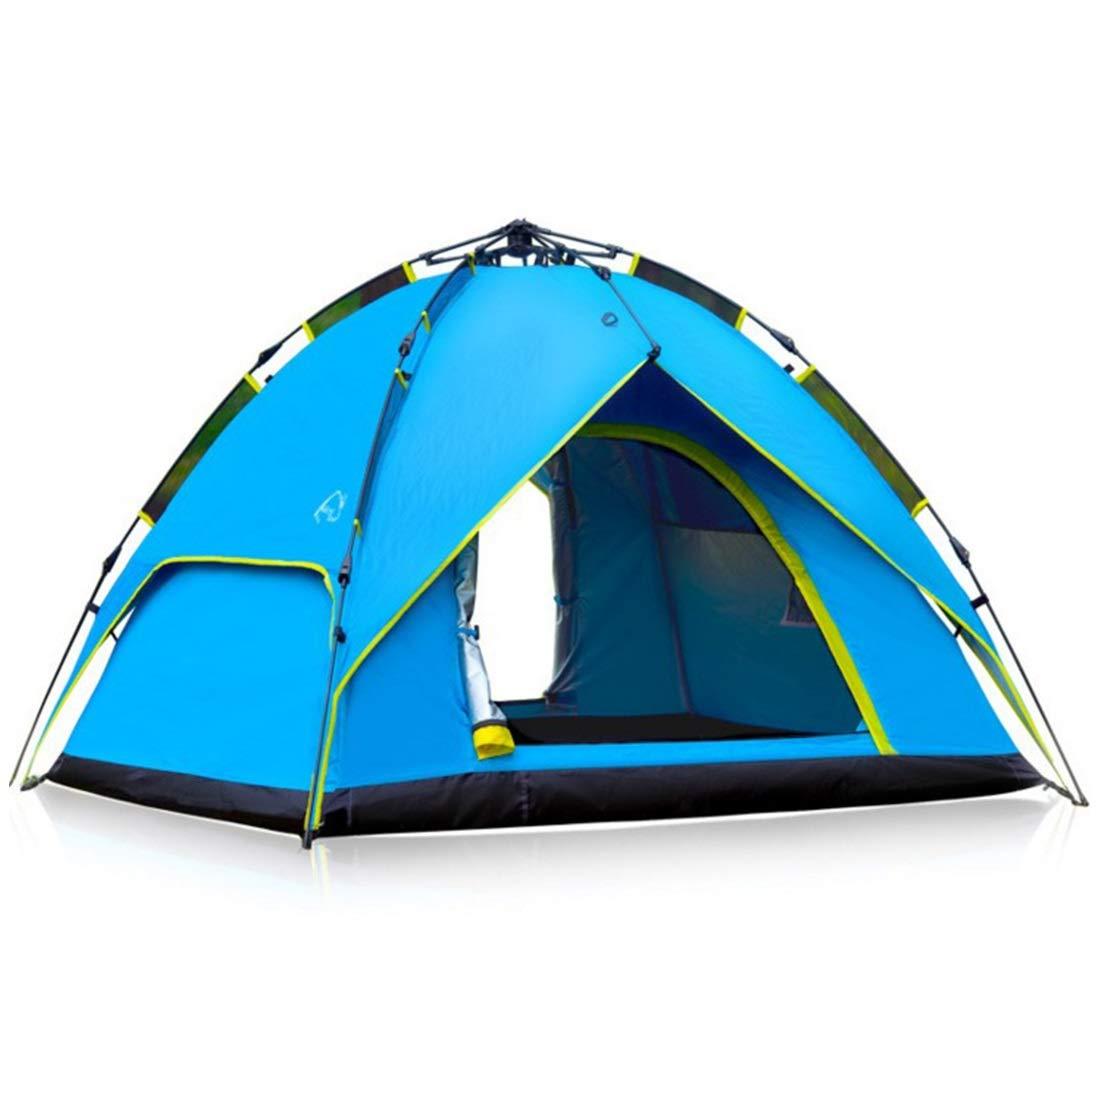 MINGANGSAYONE 3-4 Personen Zelt Outdoor Automatische Set Camping Camping Zelt Doppelregensichere Zelt